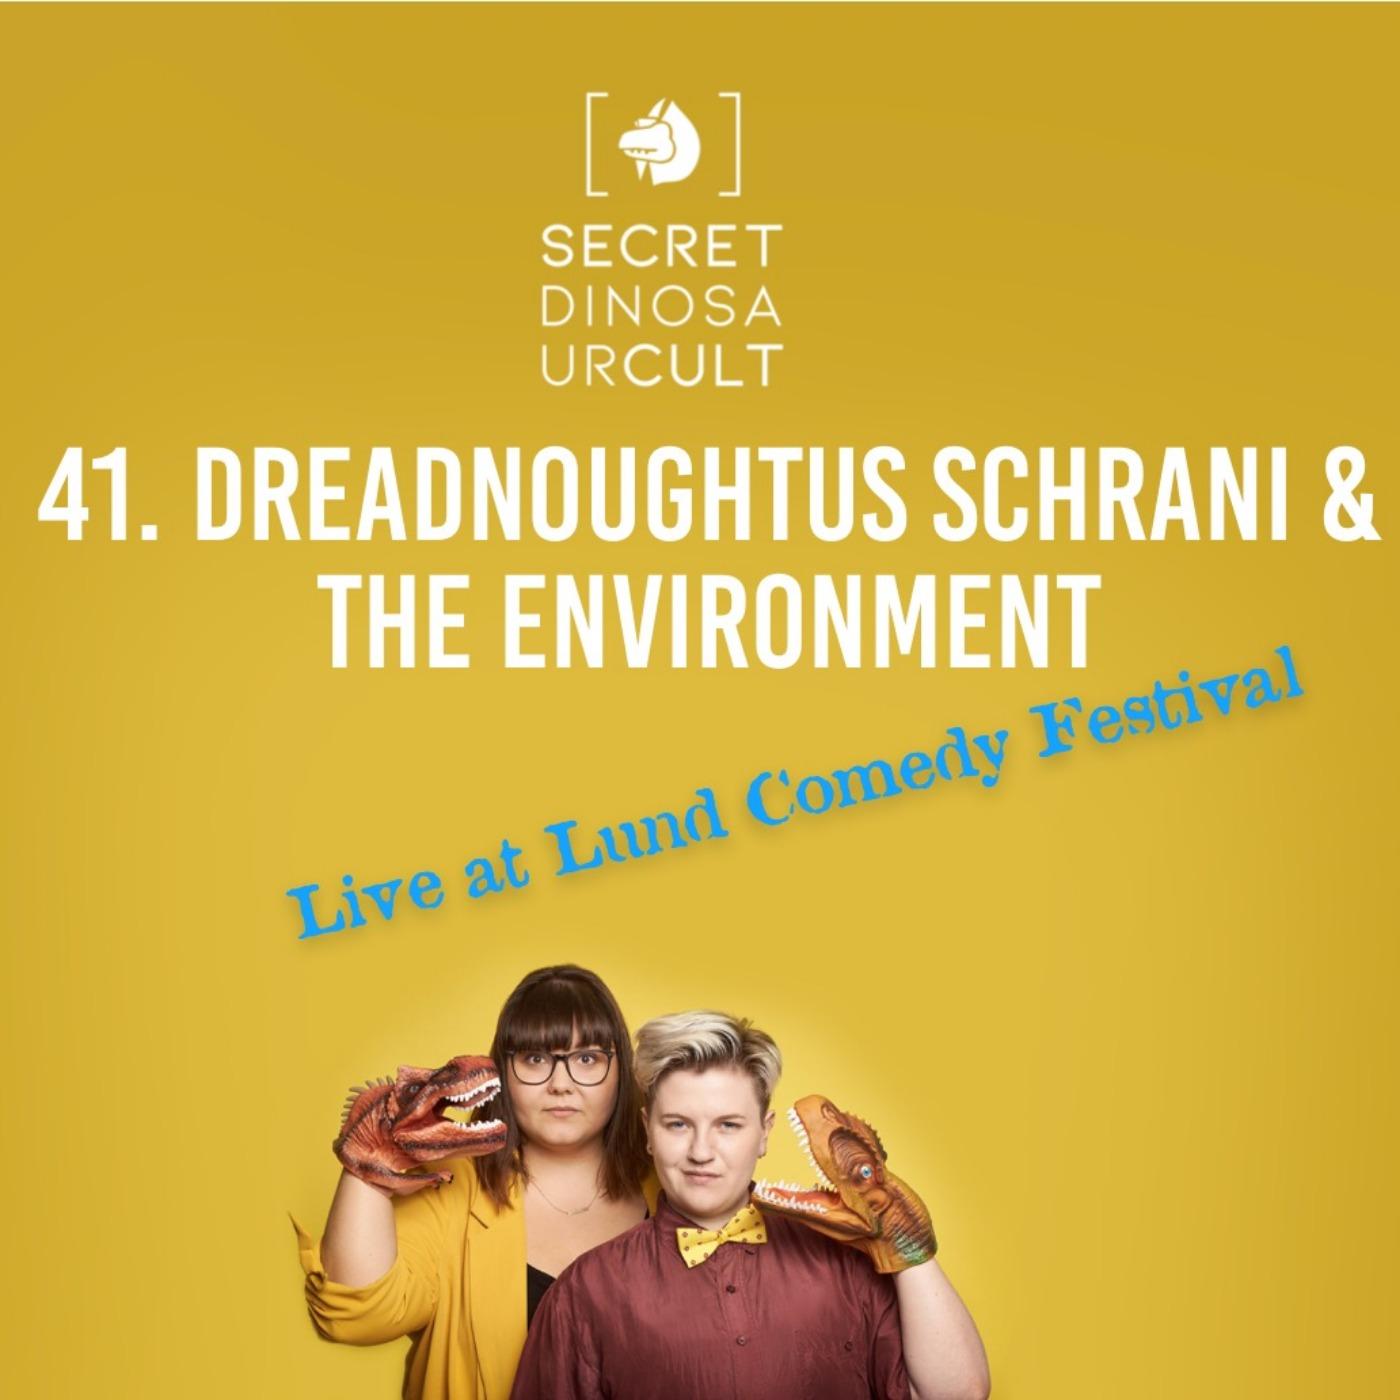 Dreadnoughtus Schrani & The Environment- Live at Lund Comedy Festival